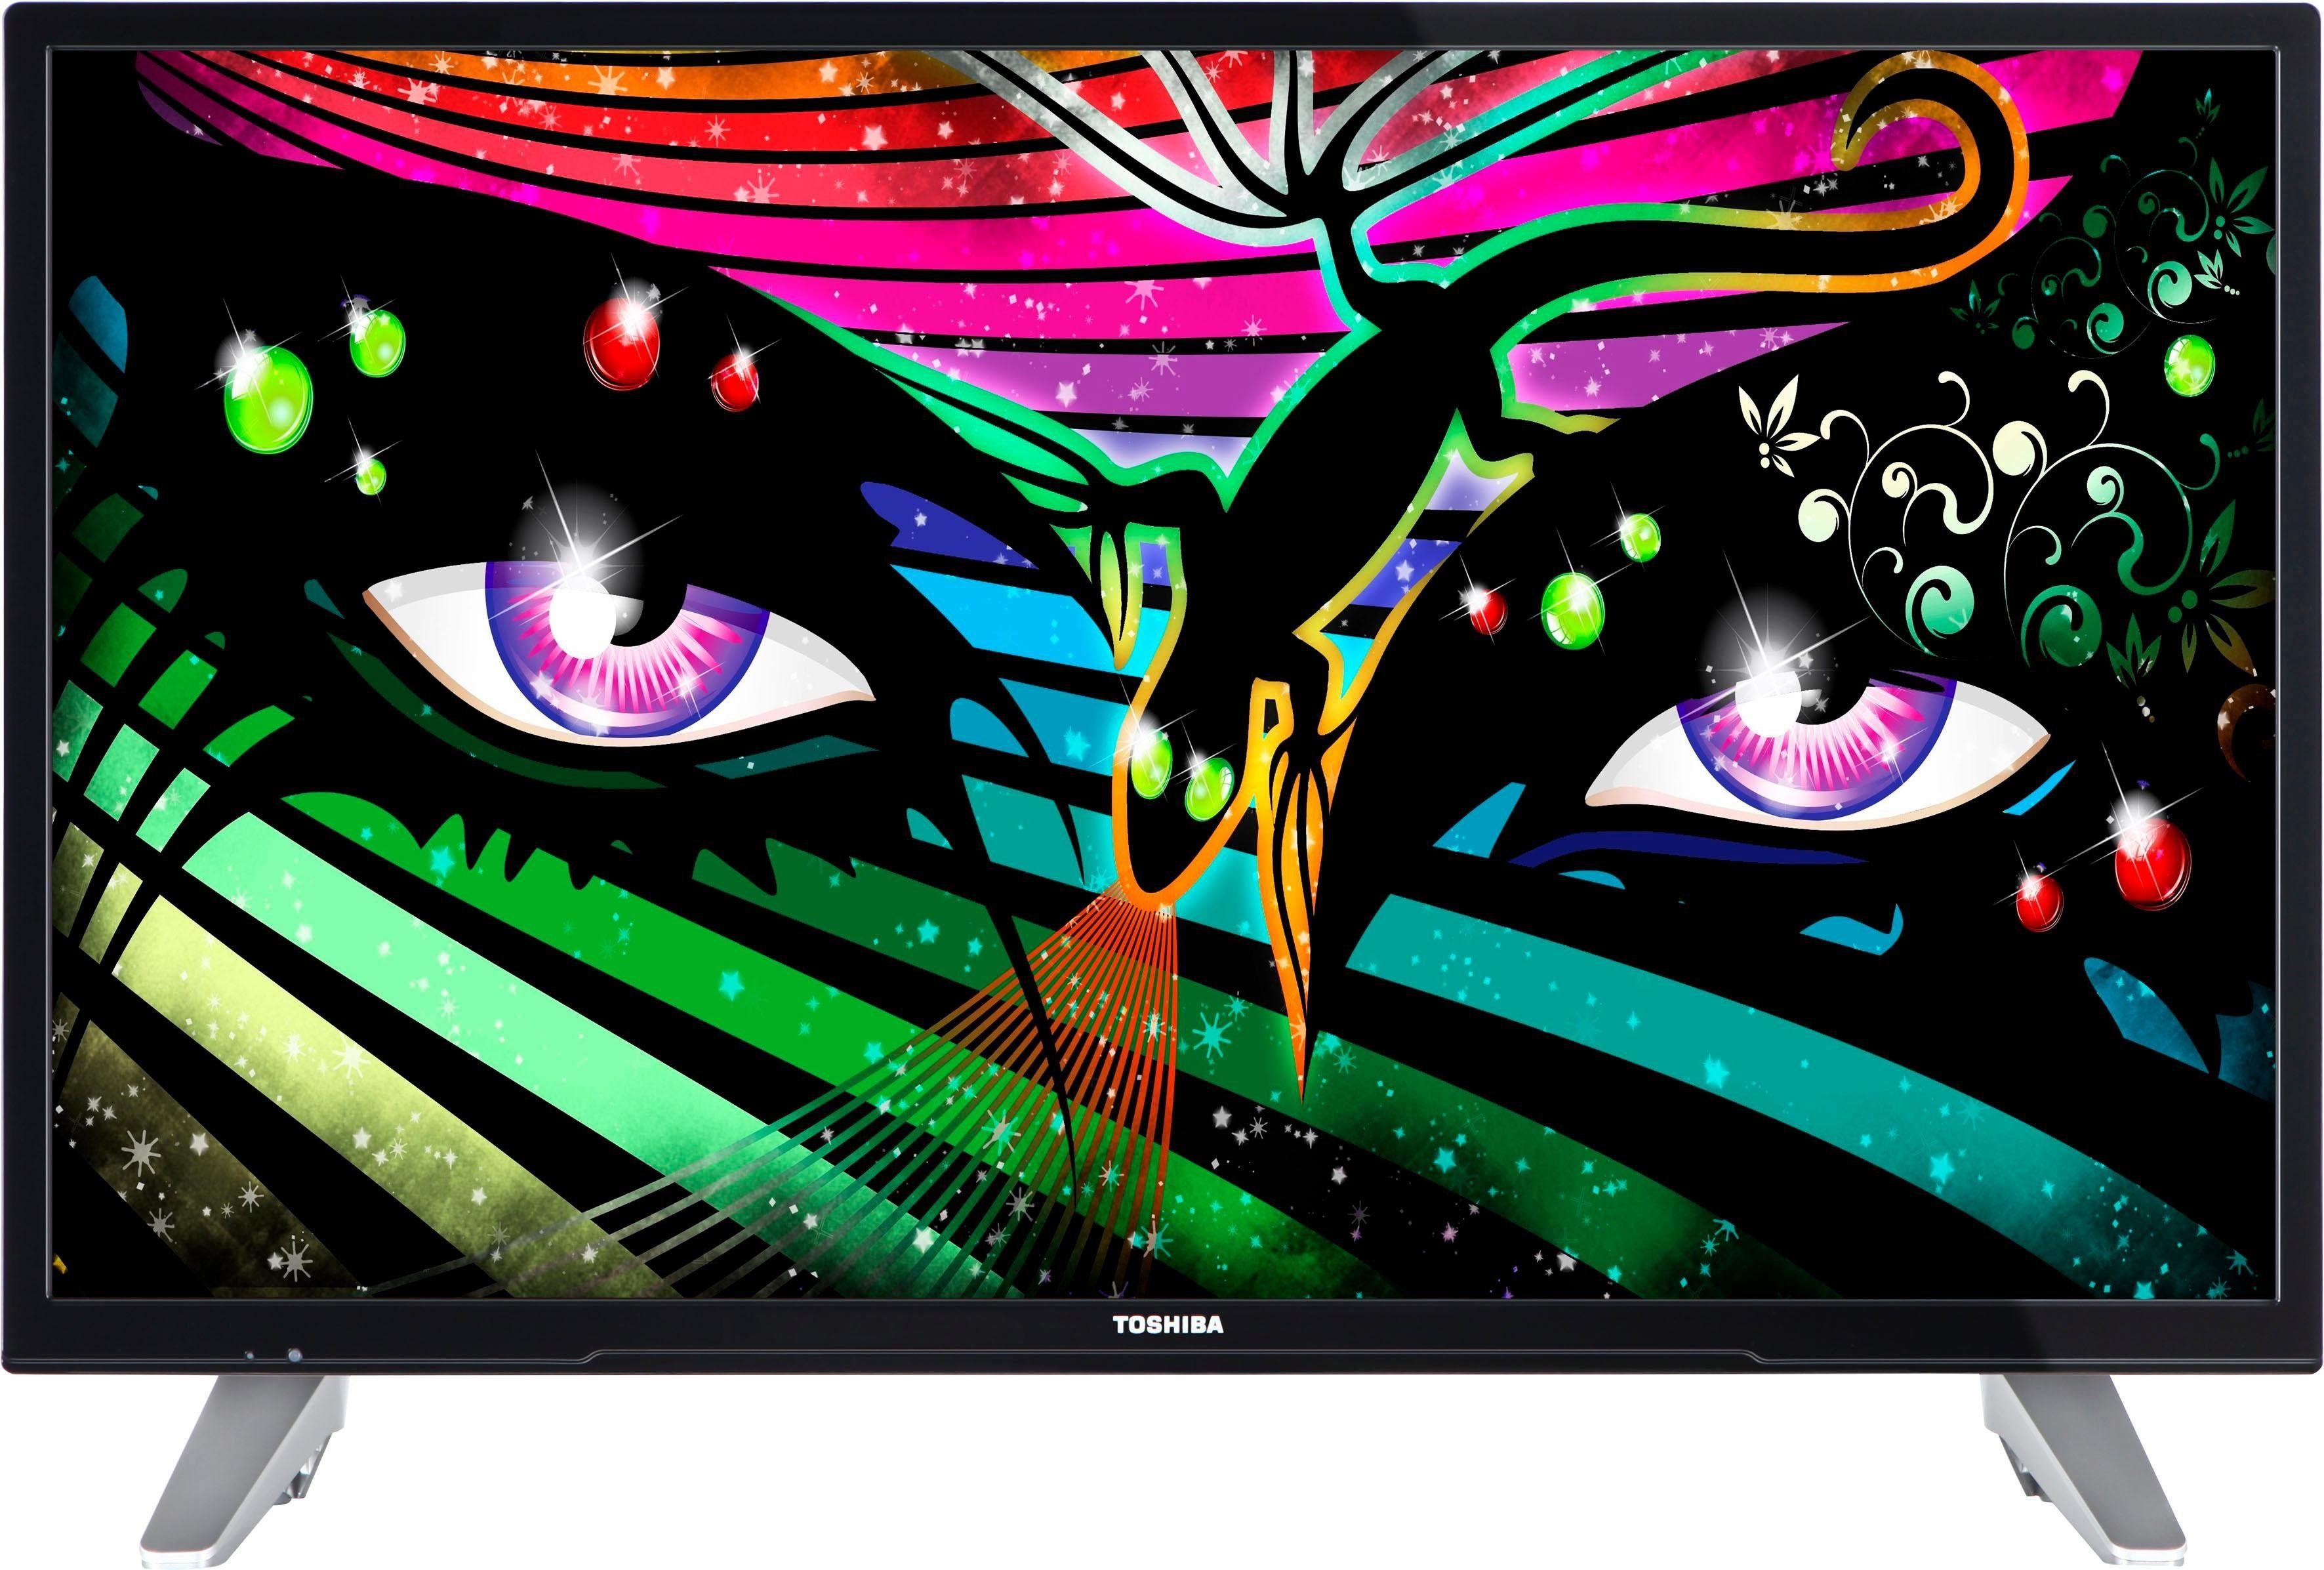 Toshiba 32L3663DA LED-Fernseher (81 cm/32 Zoll, Full HD, Smart-TV)